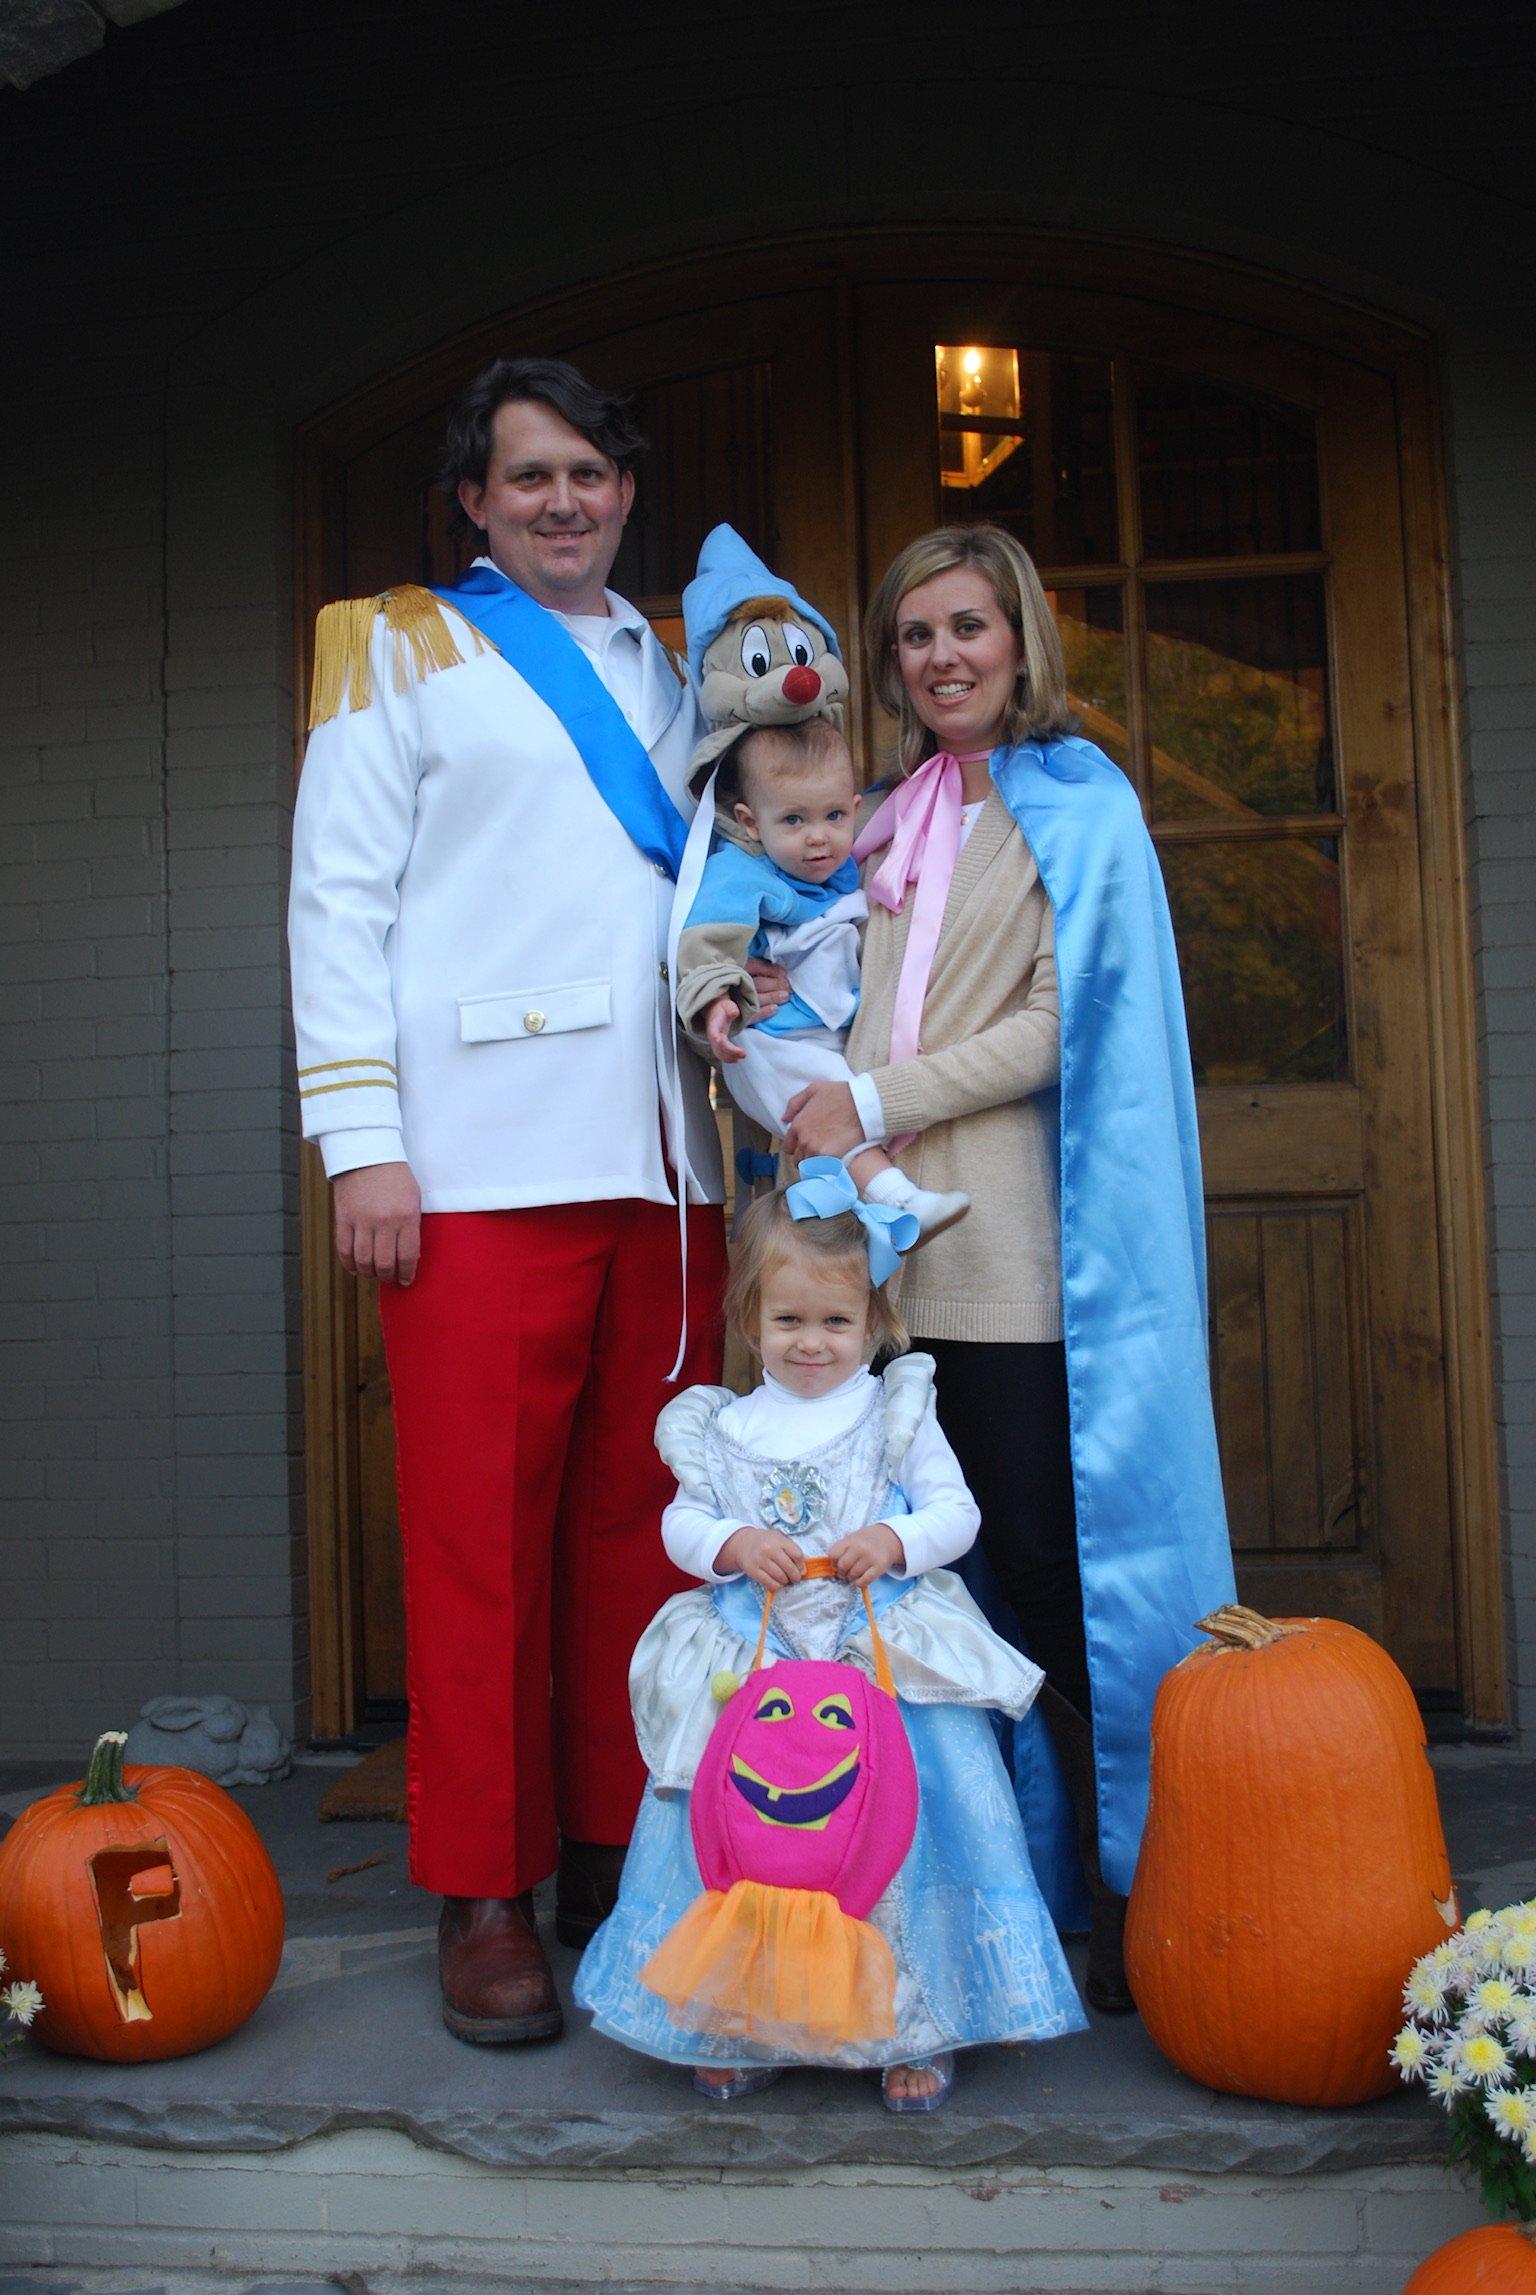 Cinderella and Prince Charming family Halloween costume